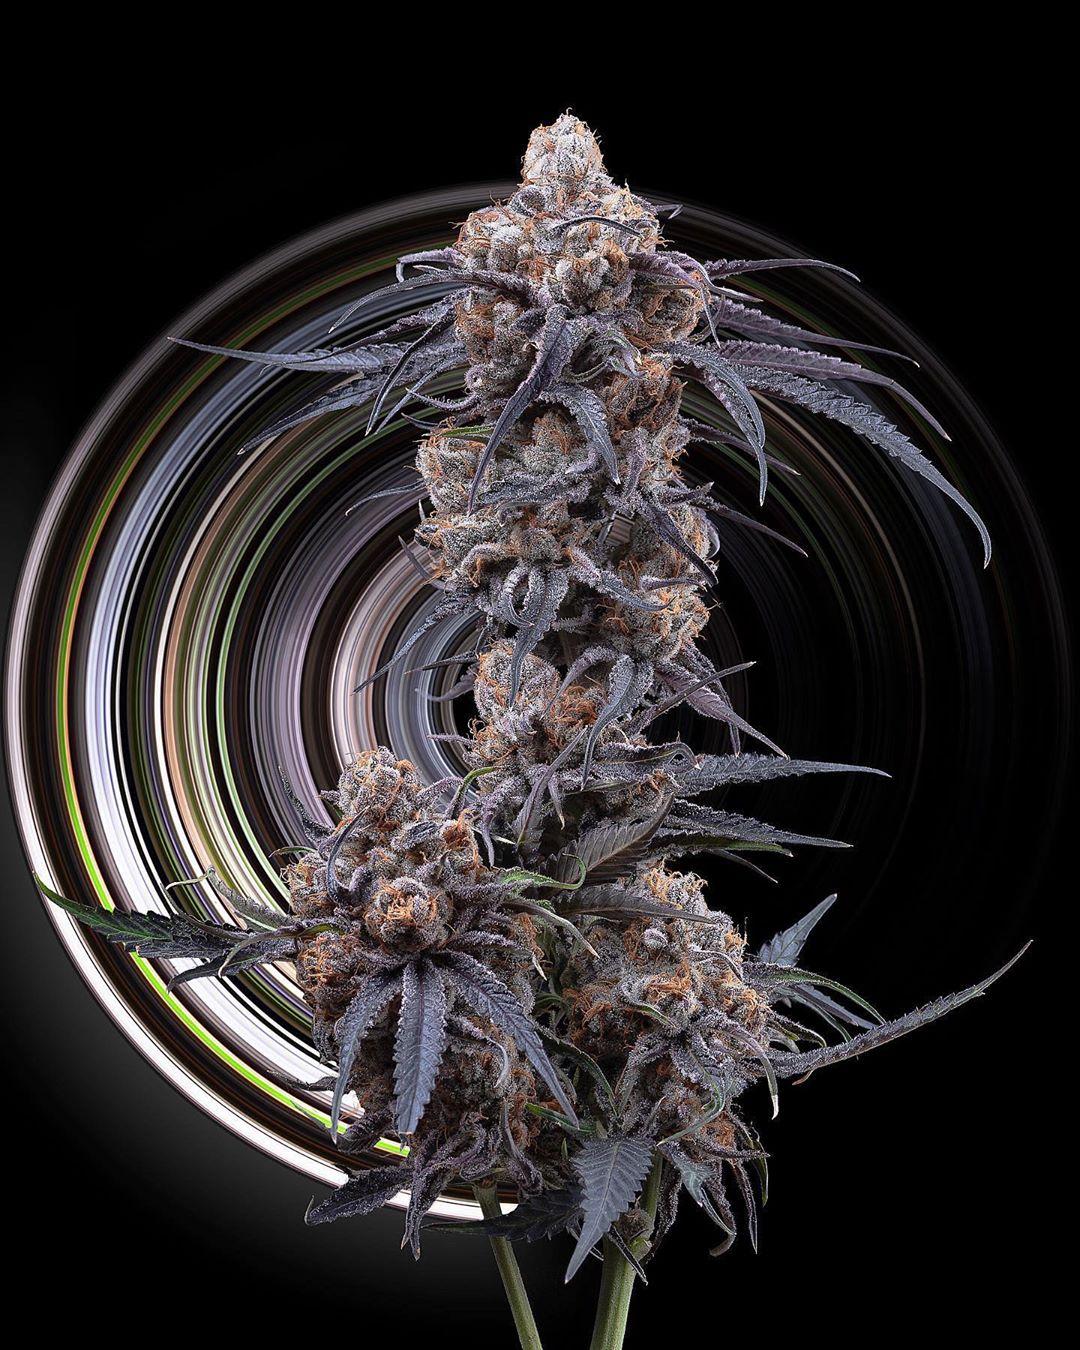 Purple_Punch_cannabis_clones_maine_bud_flowering@surfacearea999